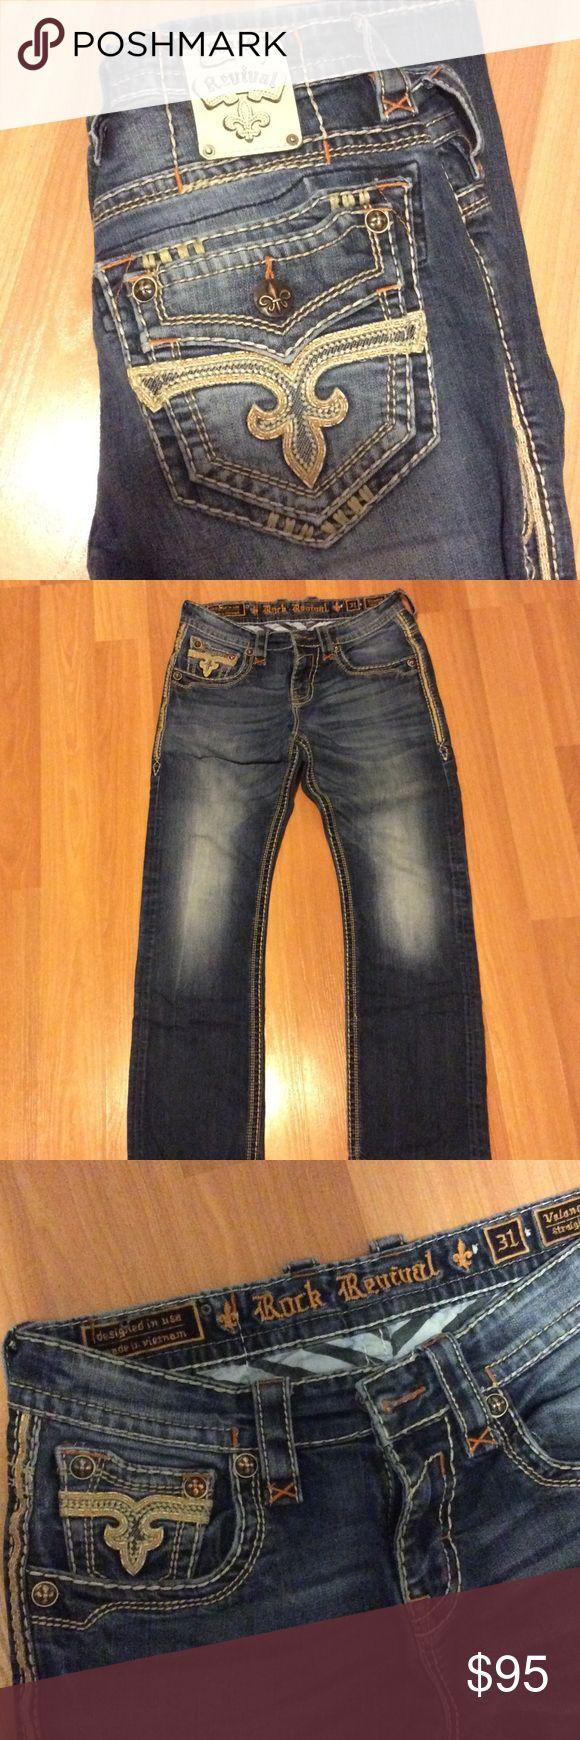 Rock Revival Brand New Men's Jeans! Orange Stitch, worn three times.  Amazing condition